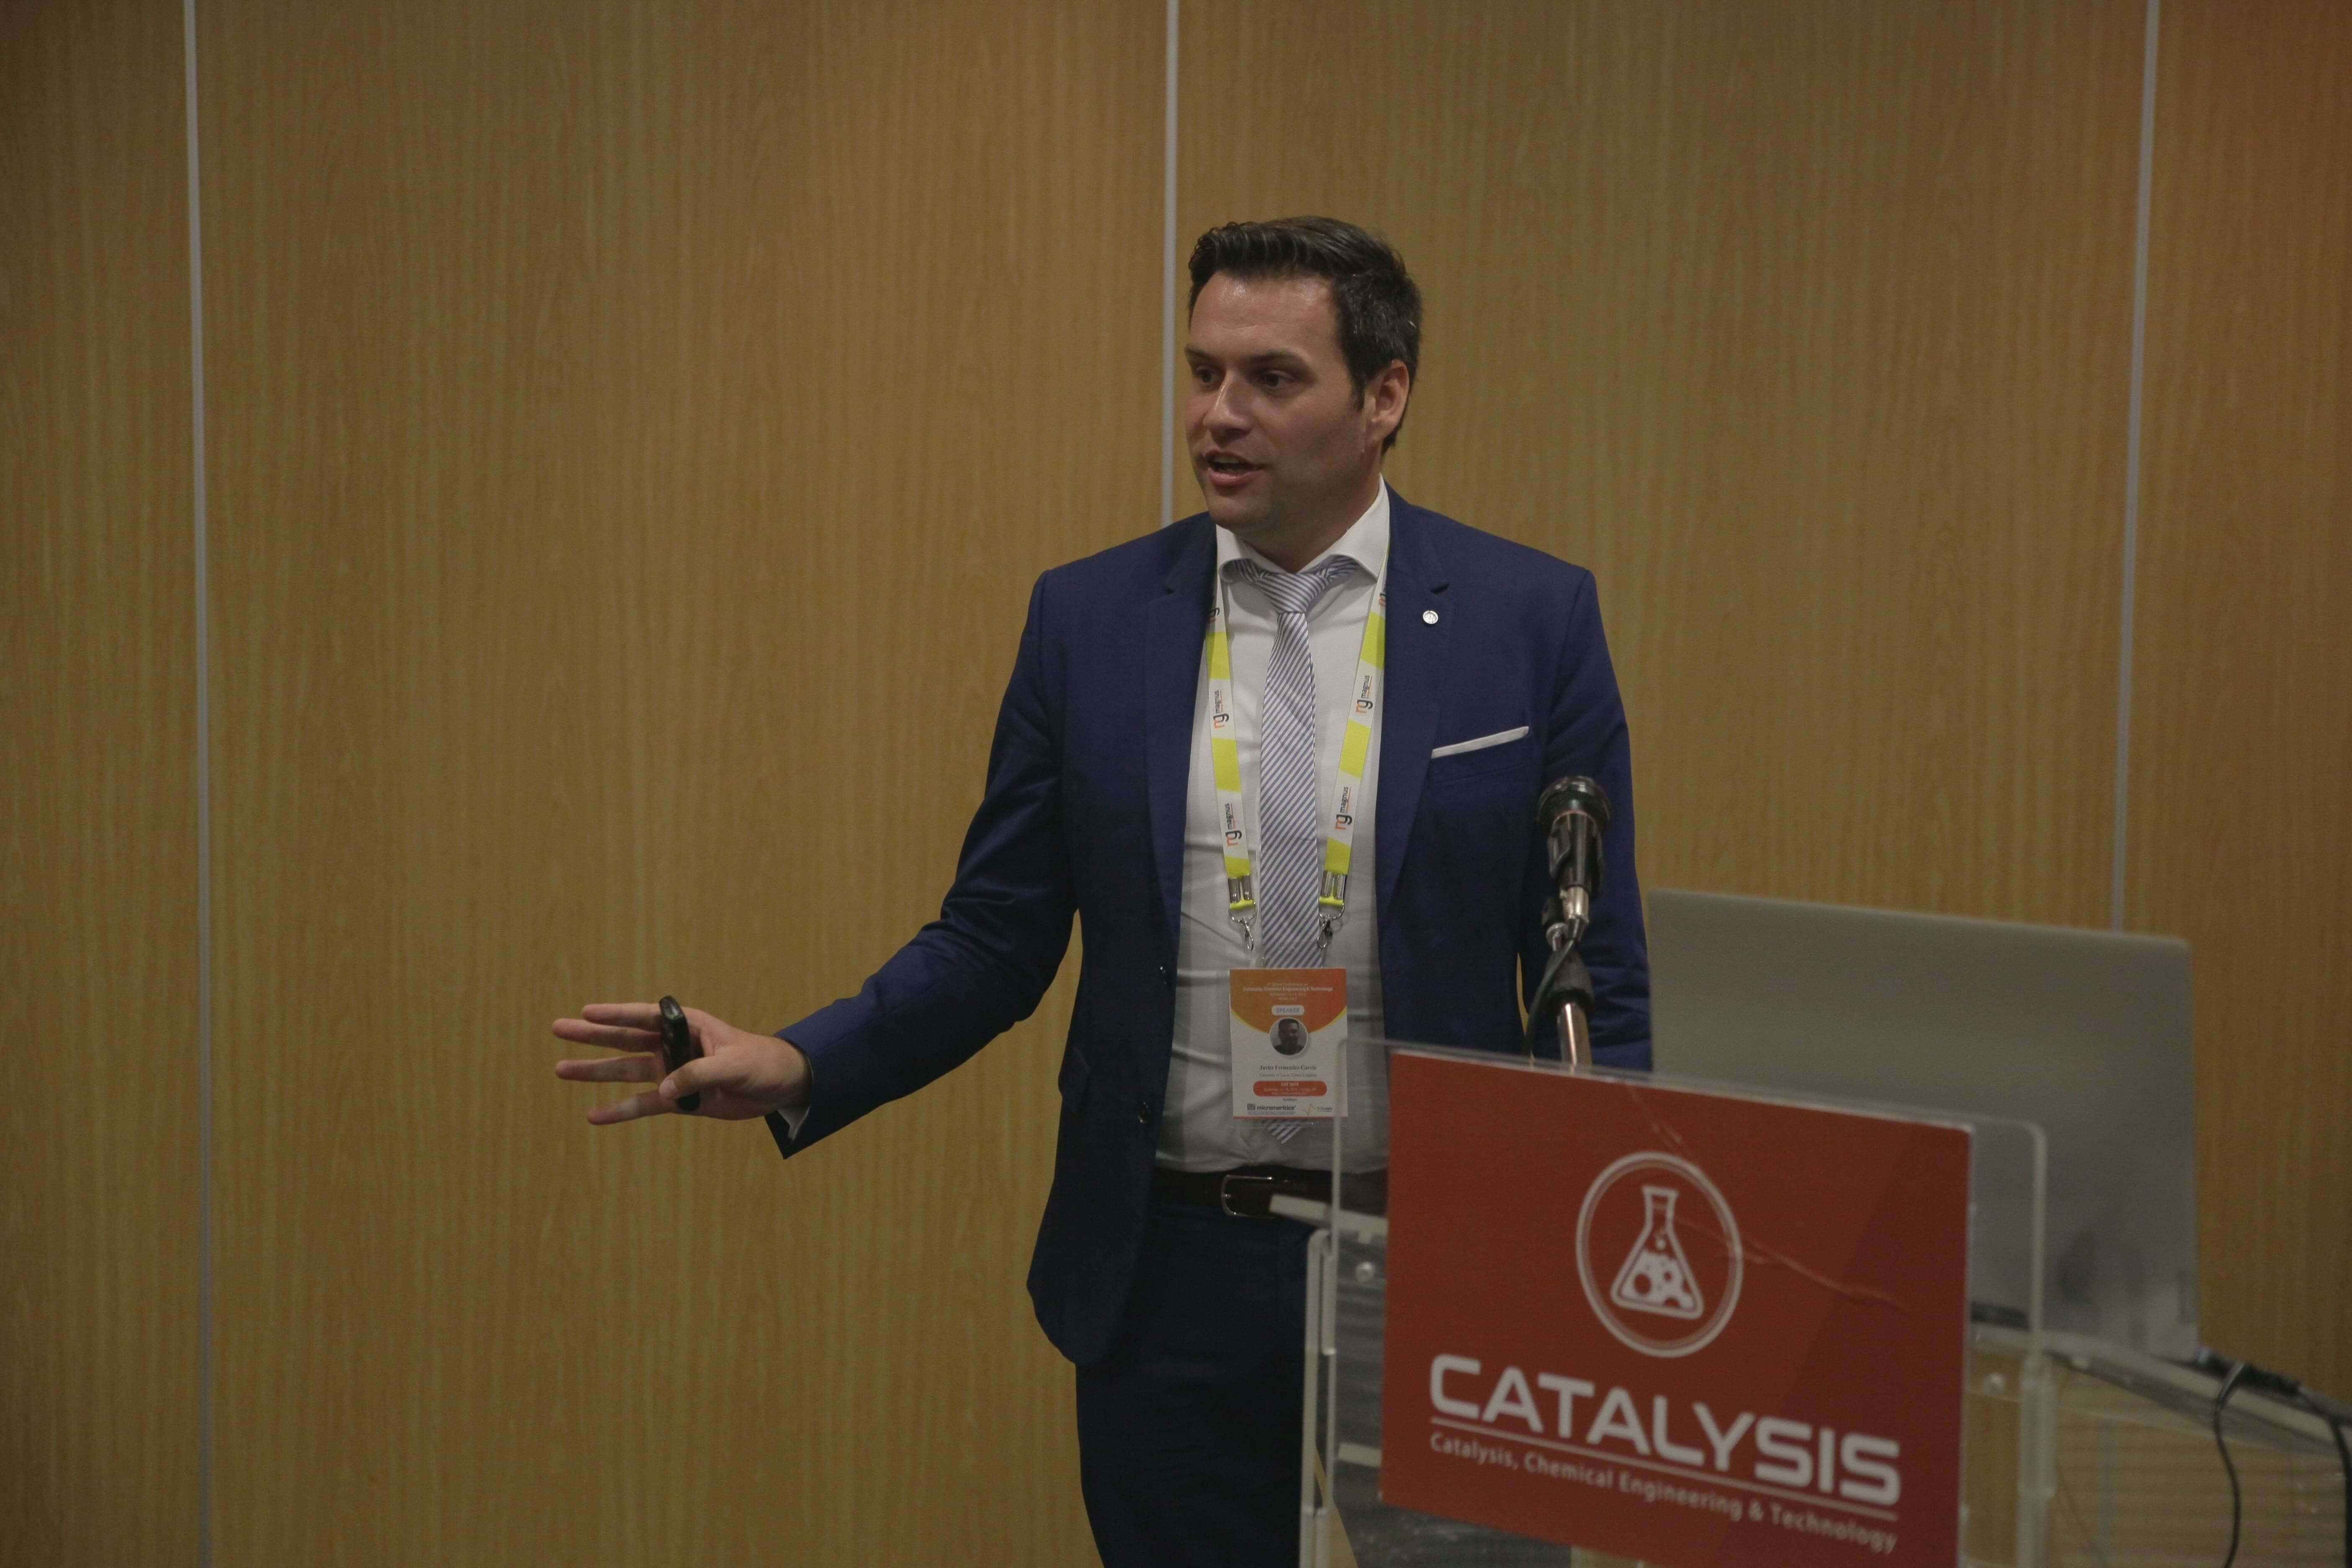 Javier Fernandez-Garcia, University of Leeds, United Kingdom